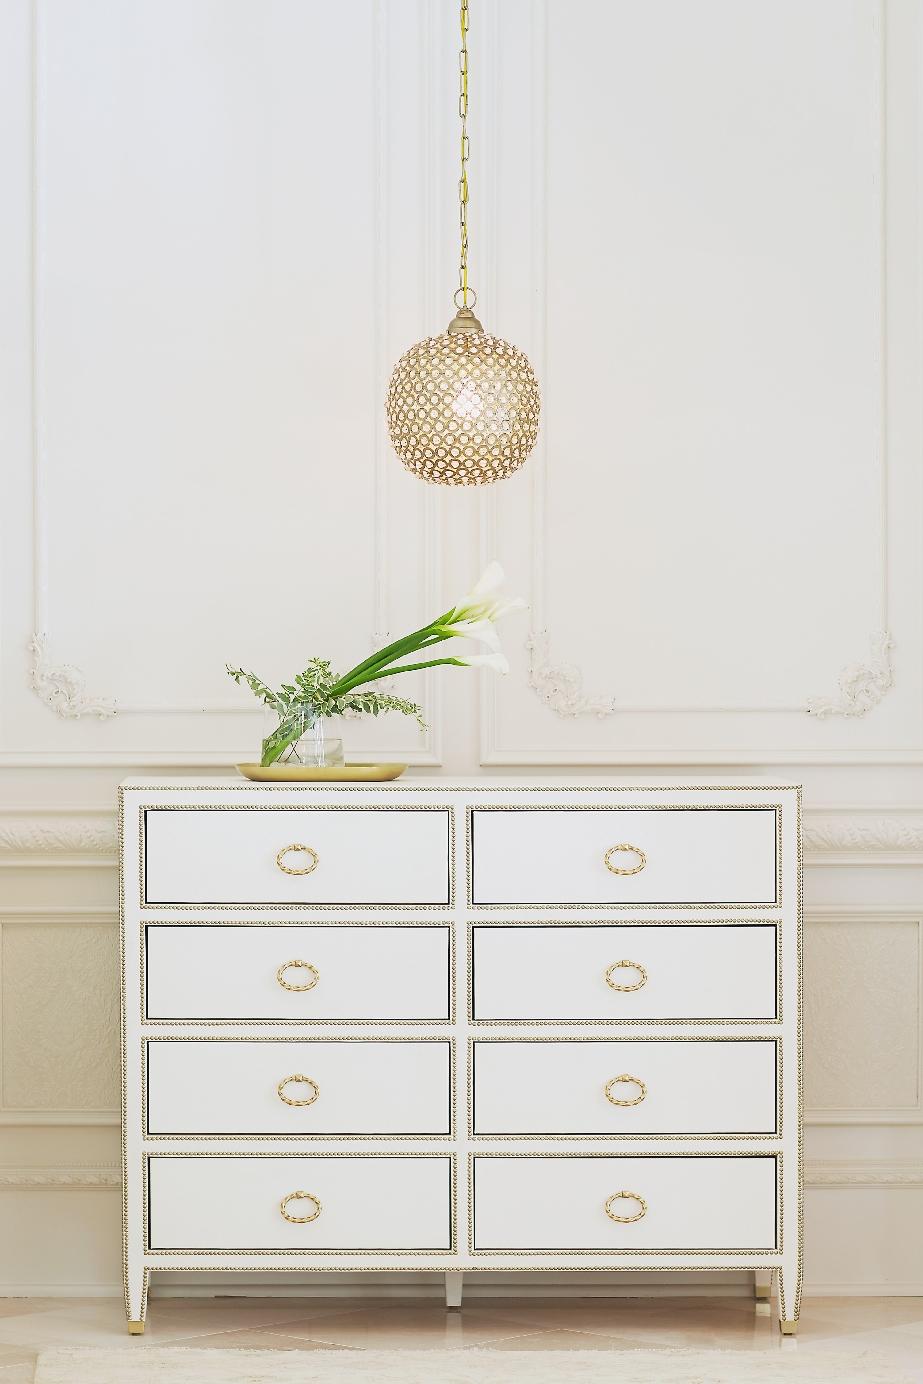 Stacey Van Berkel Photography I Elegant dresser with pendant light I White on white I Parisian Apartment I Bernhardt Furniture